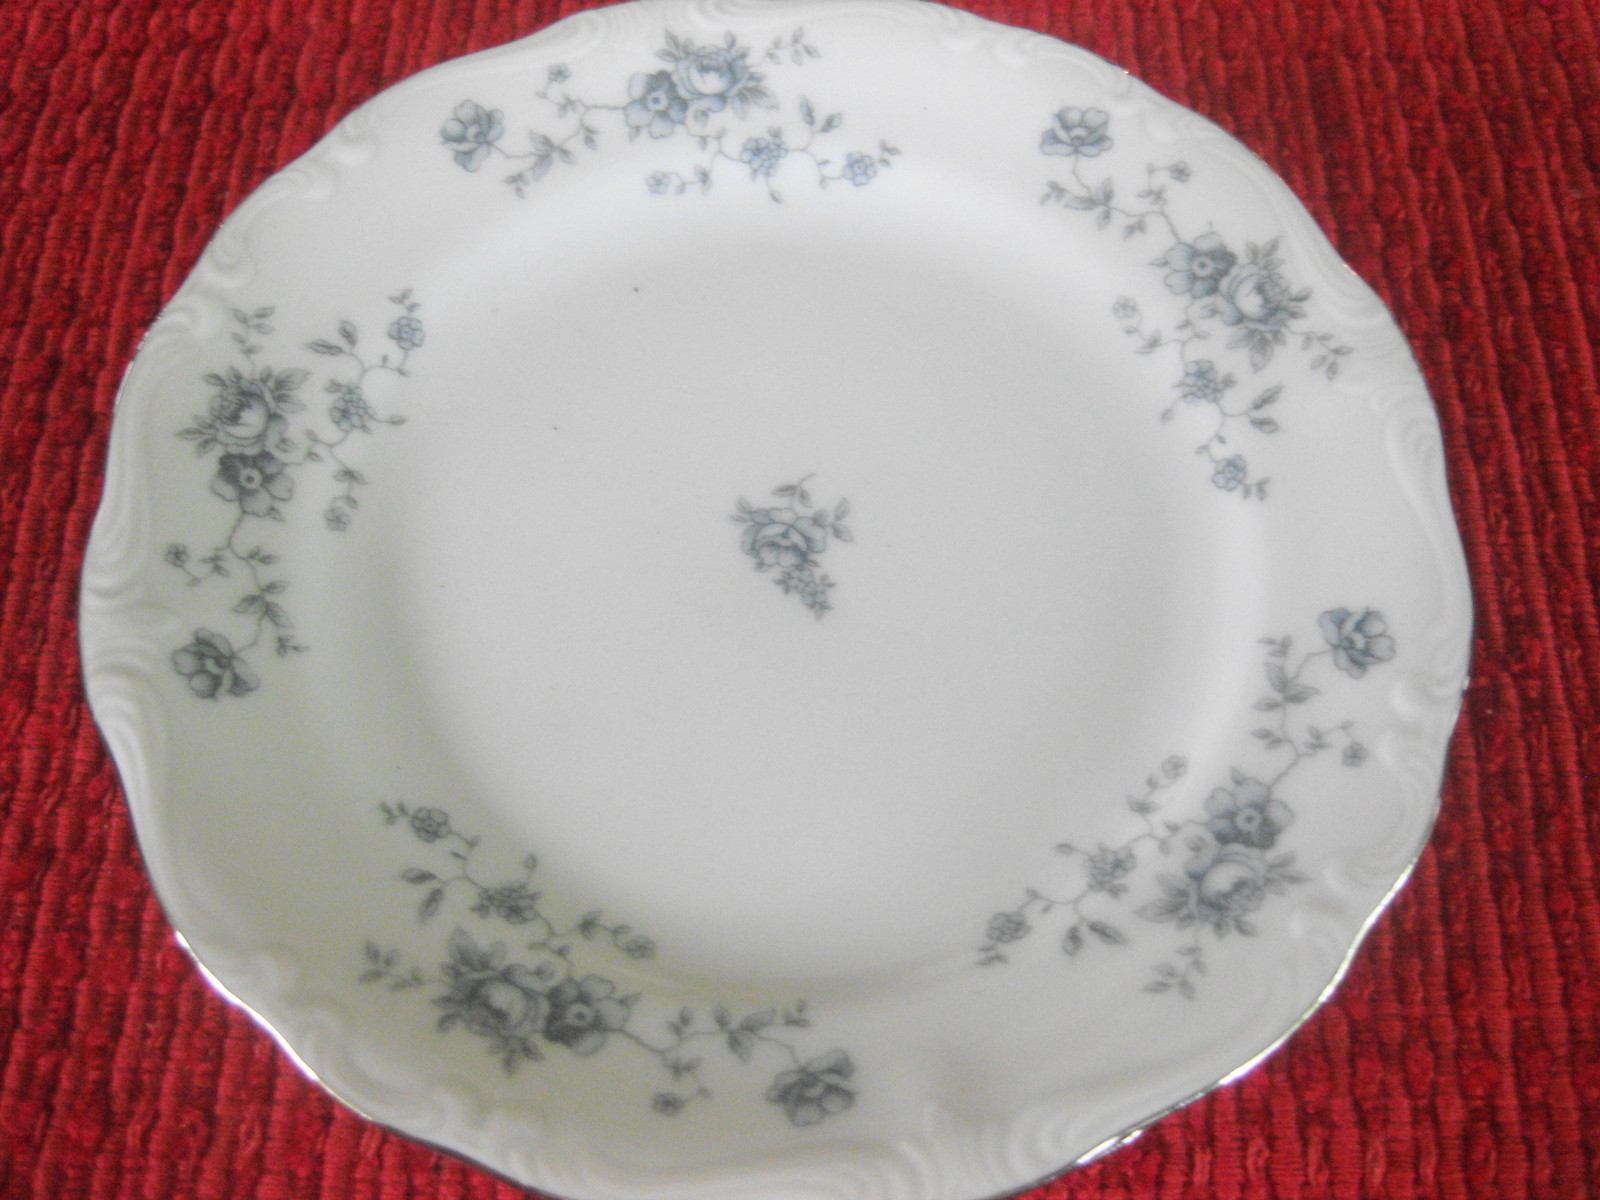 Johann Haviland Blue garland bread plate(s) Bavaria, Germany, Vintage and Nice - $2.47